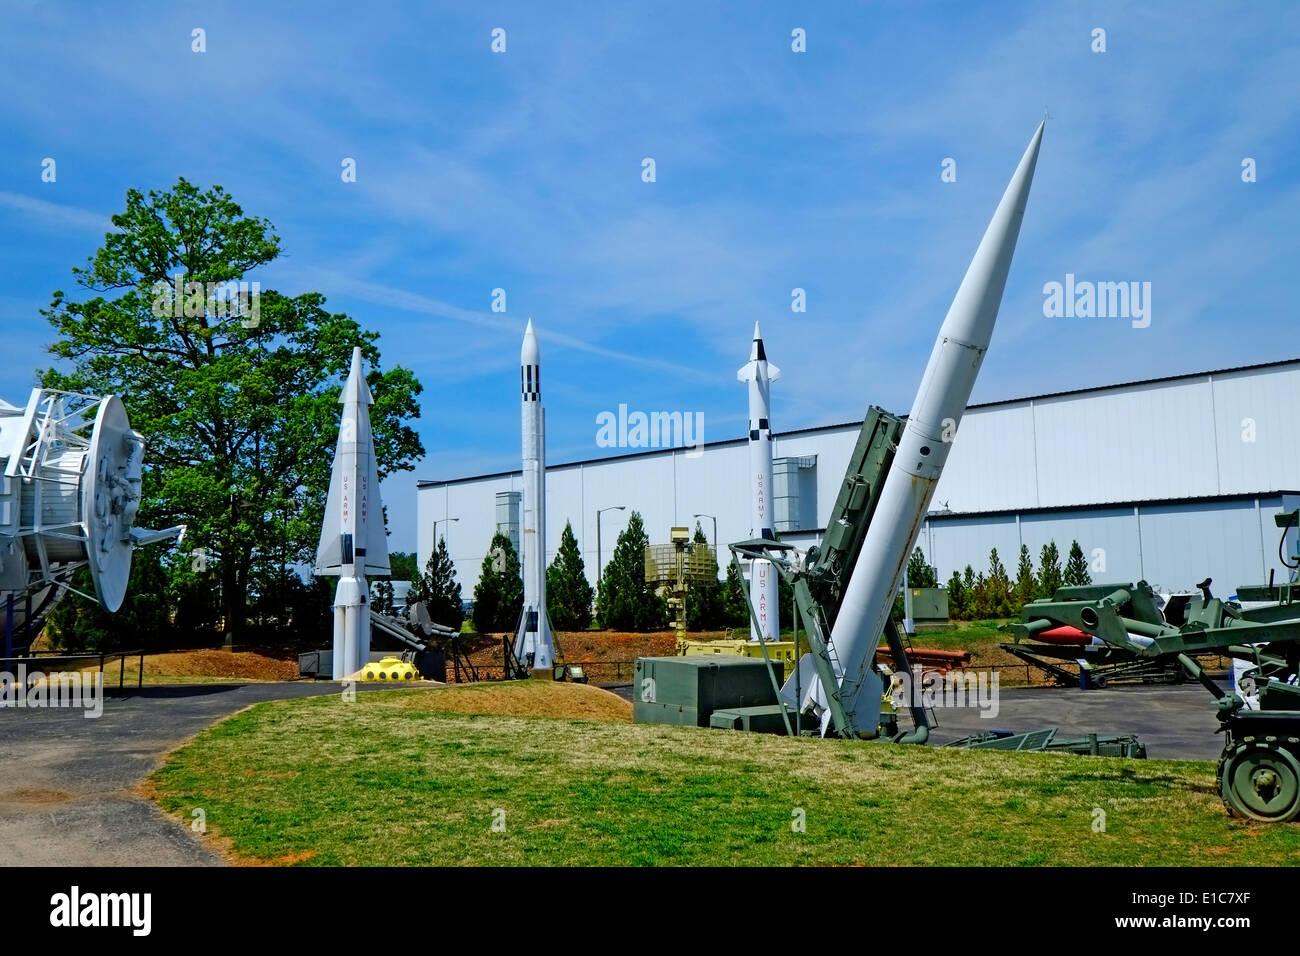 nasa huntsville space center jobs - photo #19